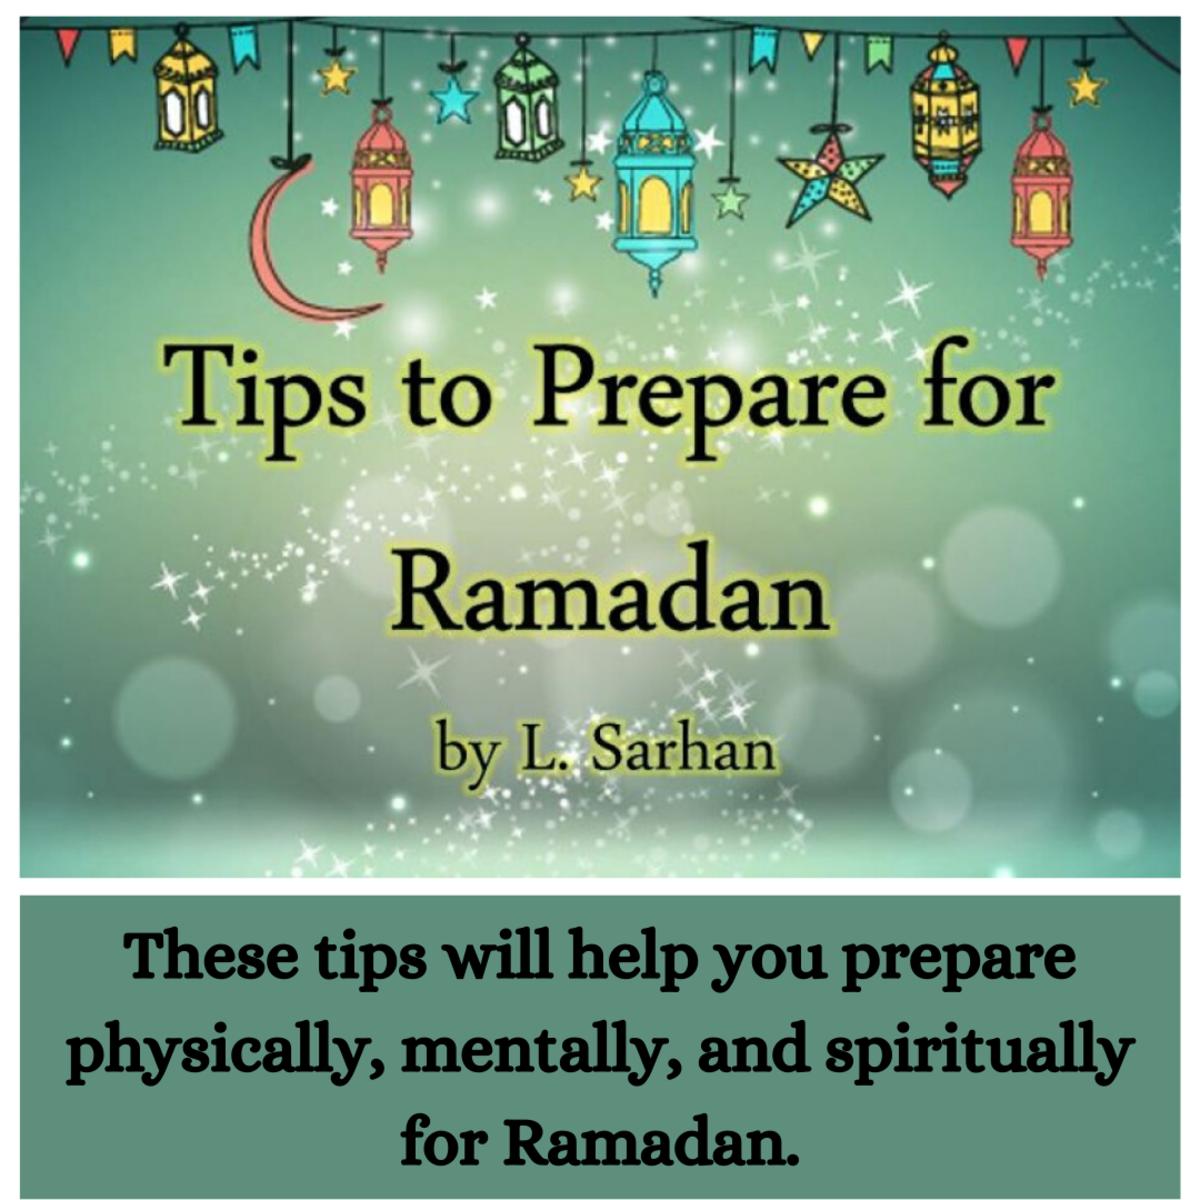 Tips to Prepare for Ramadan